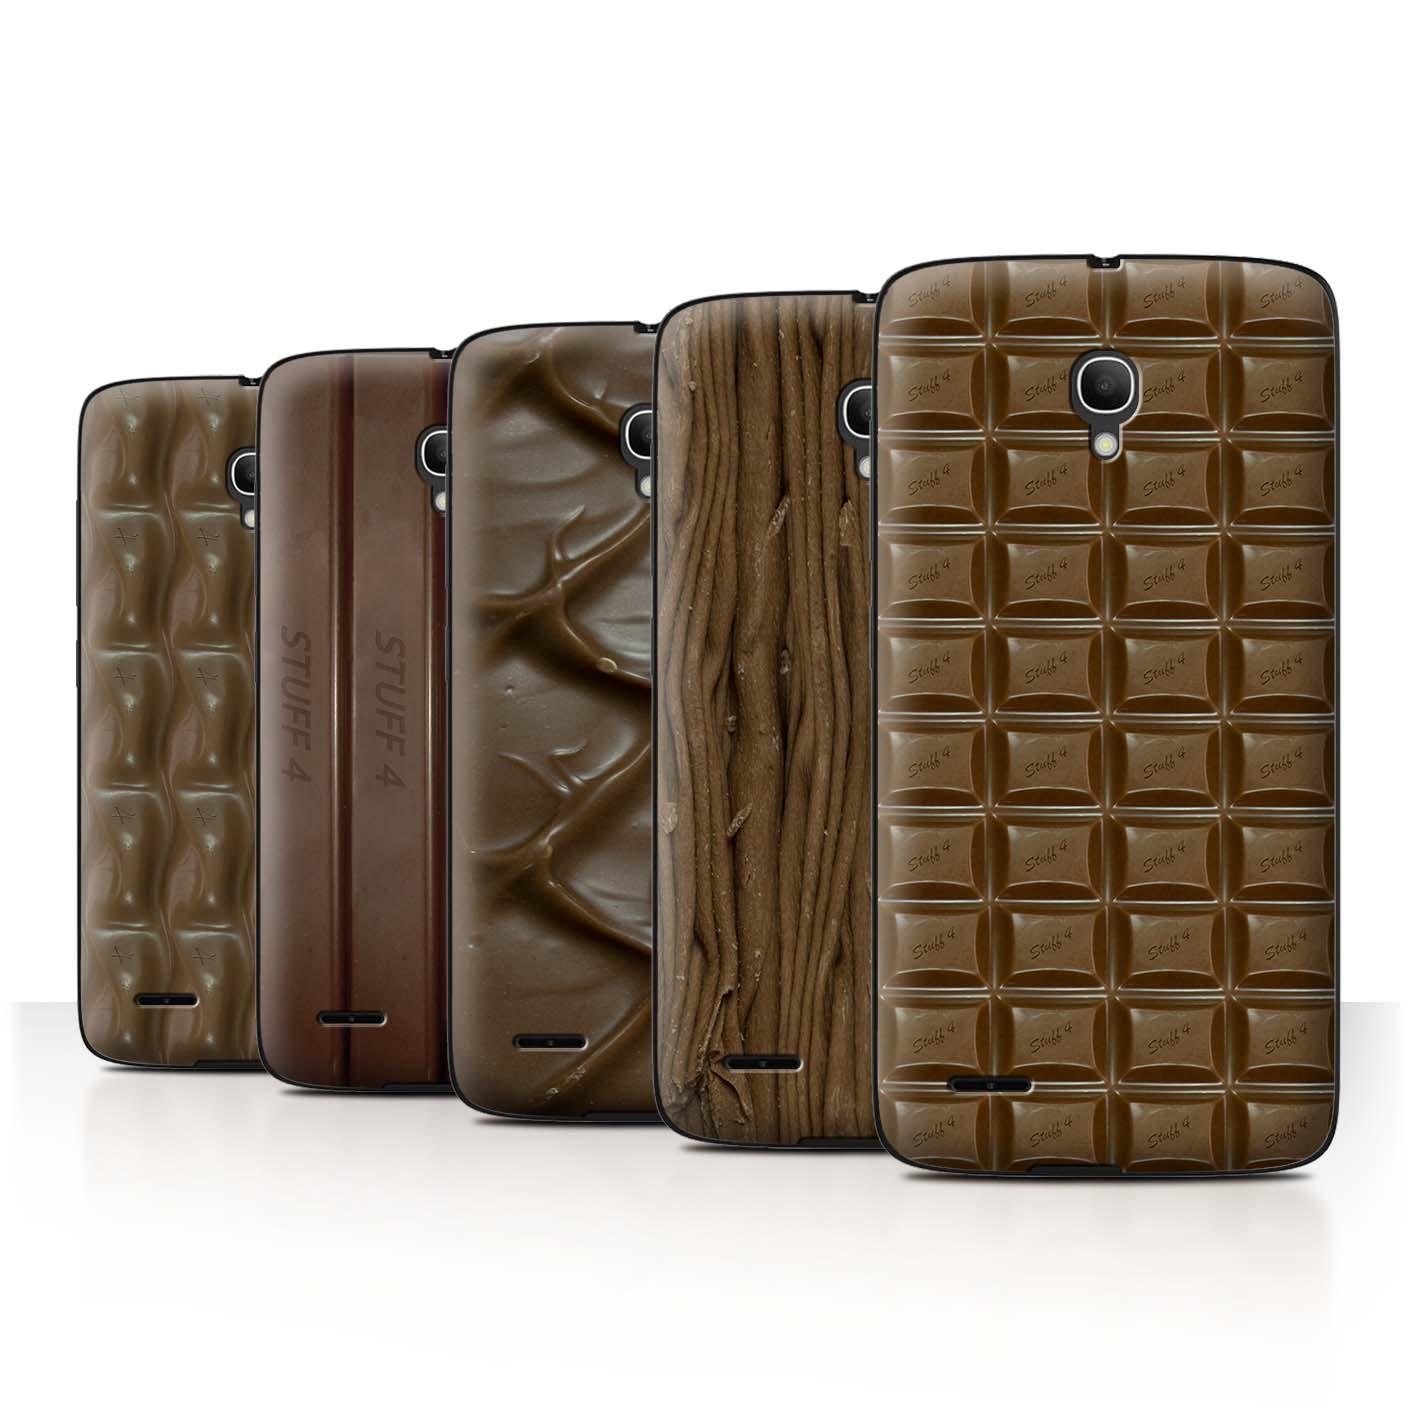 STUFF4-Back-Case-Cover-Skin-for-Alcatel-Pop-2-5-034-Chocolate